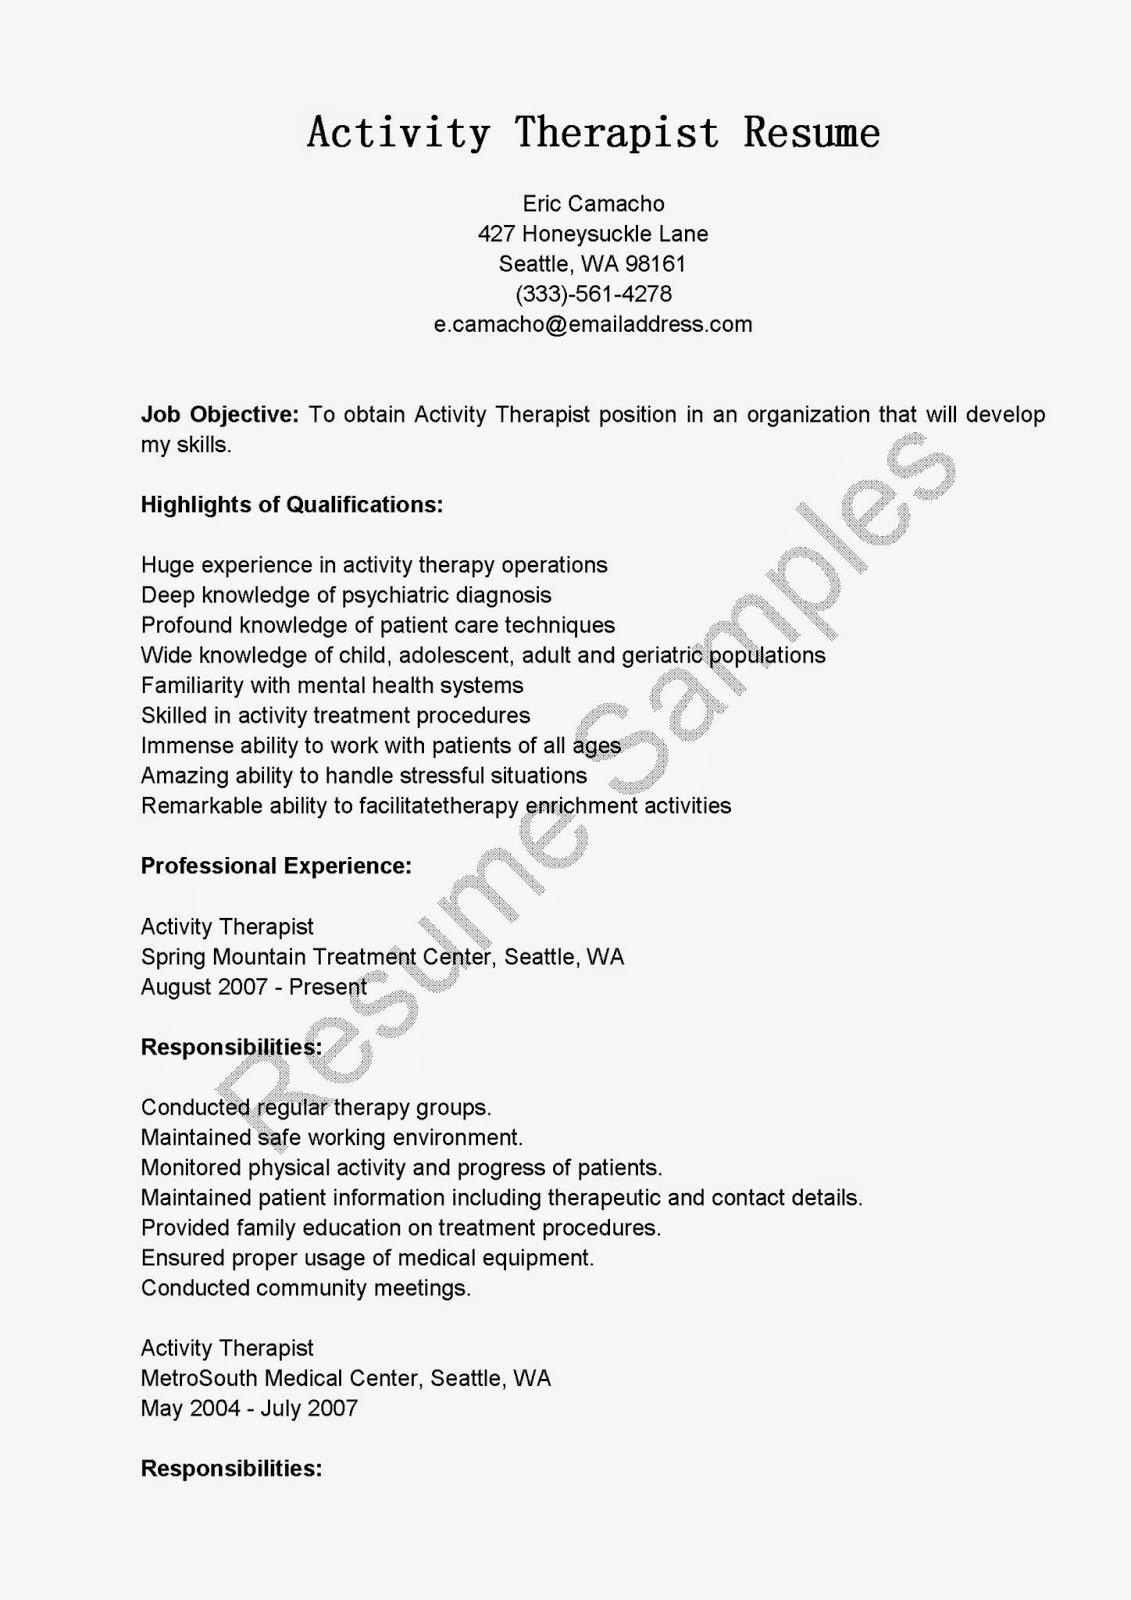 resume samples  activity therapist resume sample